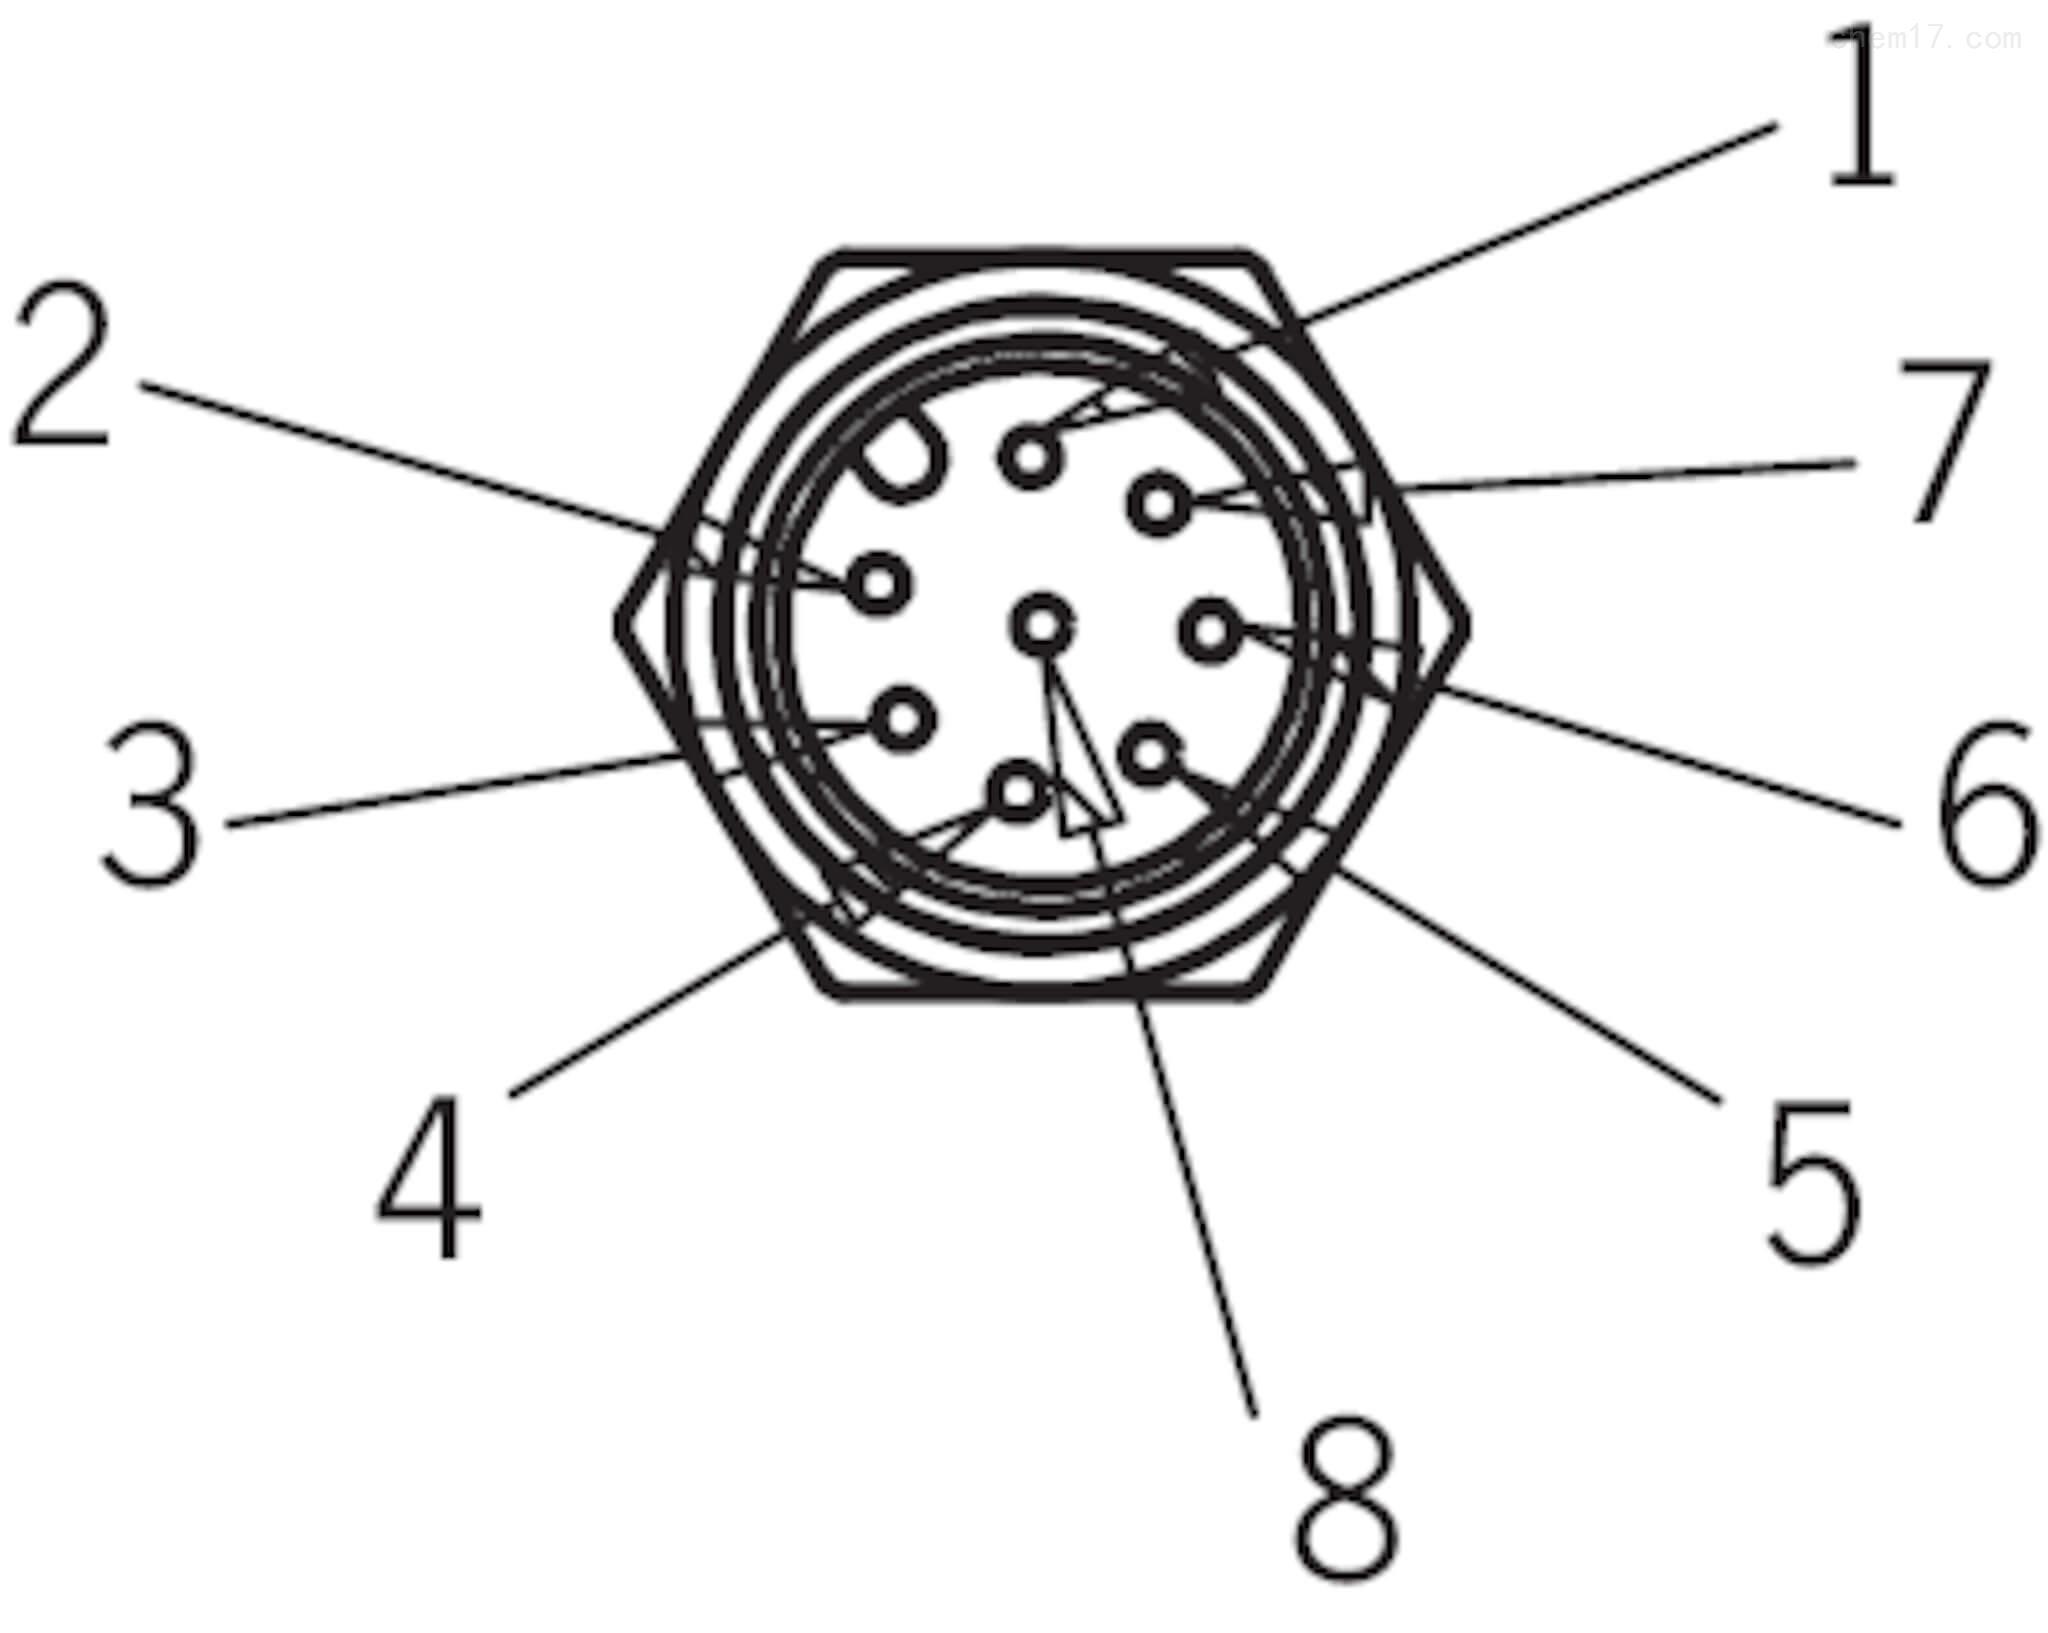 c_Stecker CES-AP M12 8-polig C.jpg